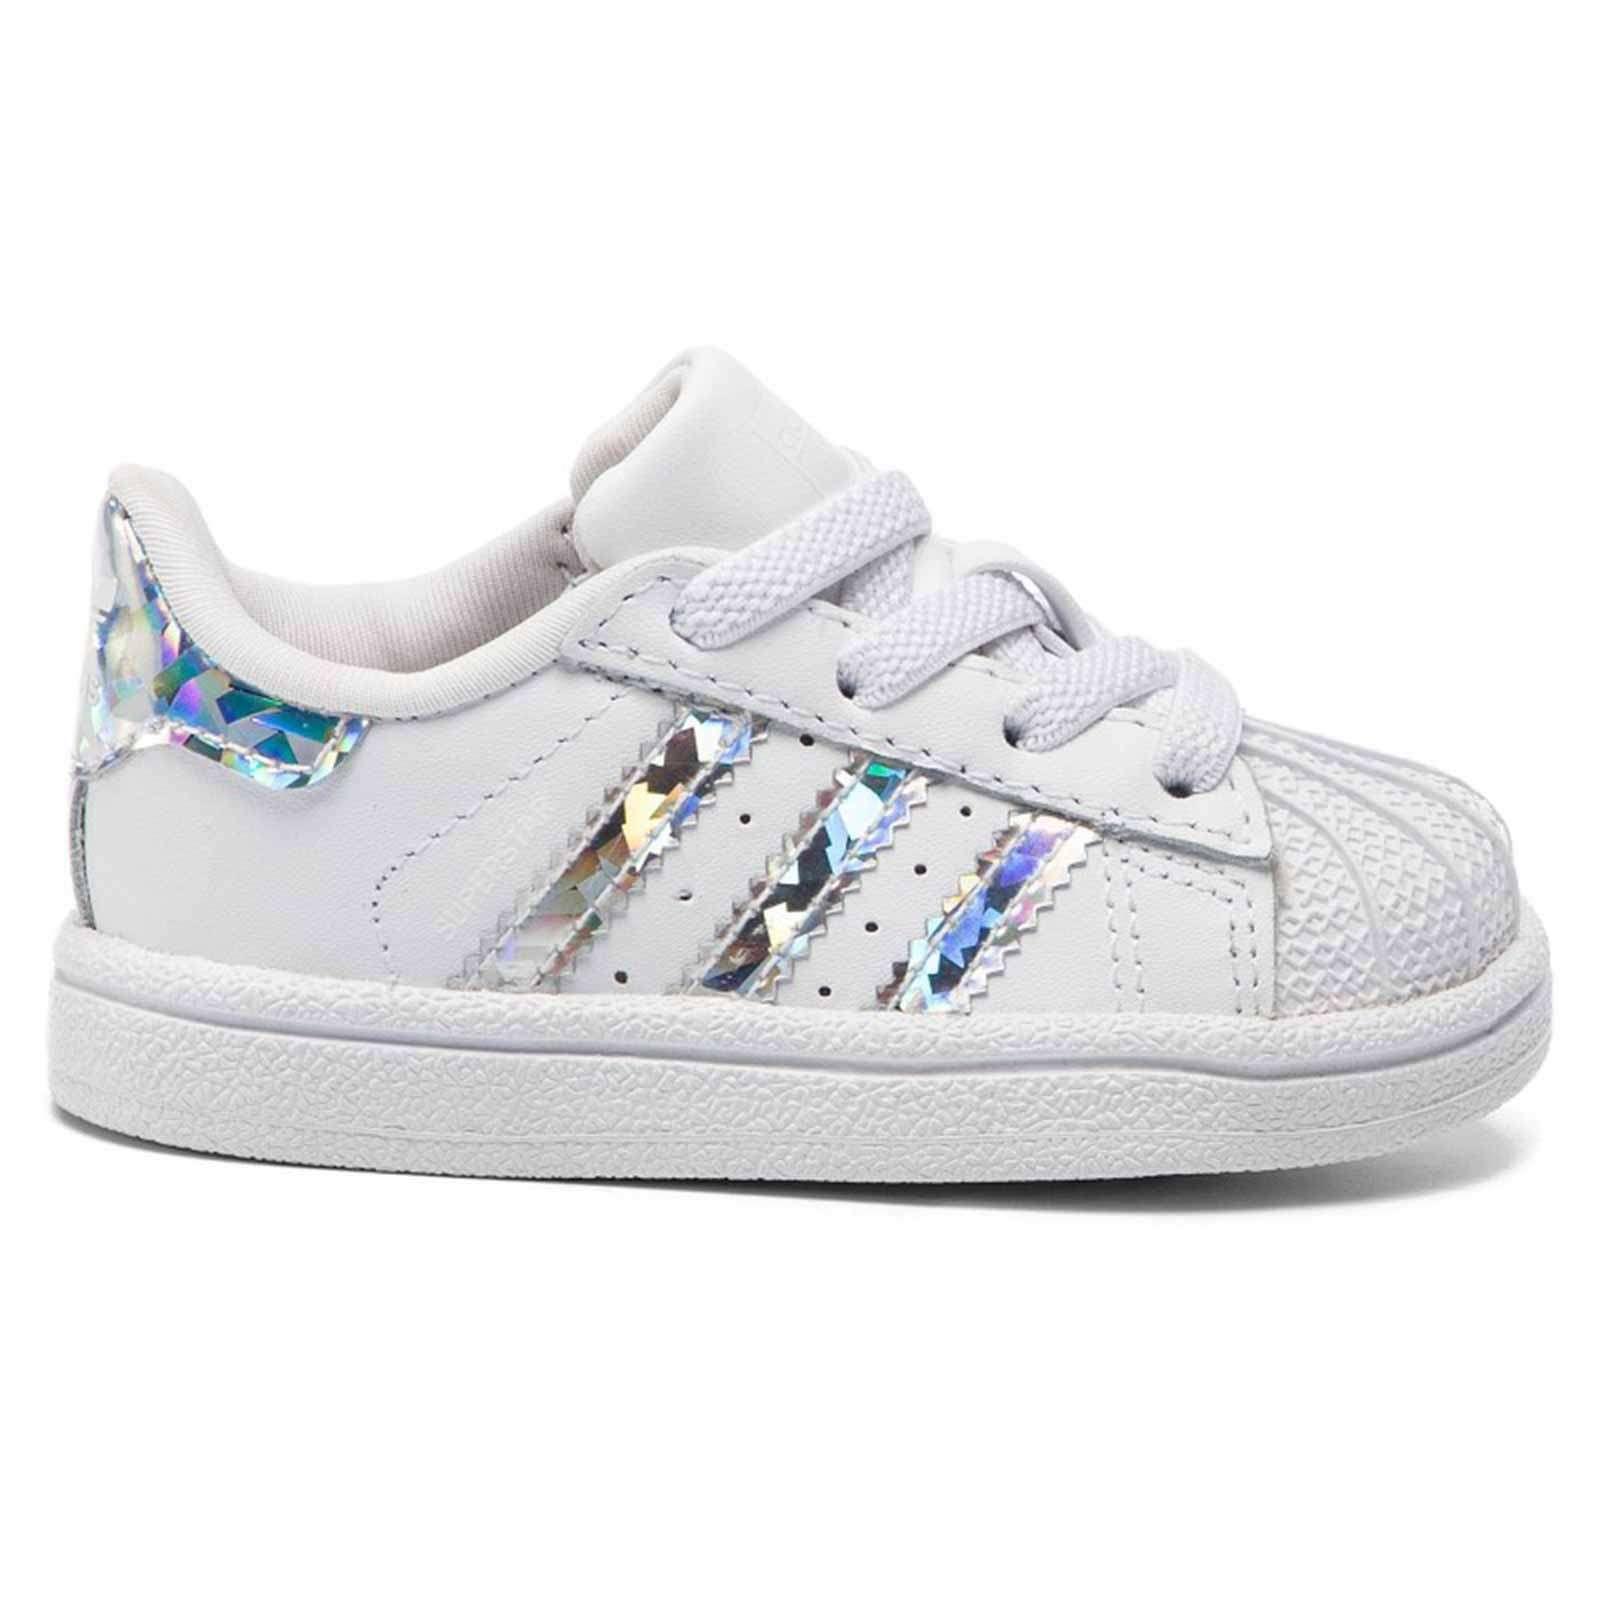 Adidas Baby Iridescent Zapatos Blanco Zapatillas Plata Girl Cg6707 iOXPkZu